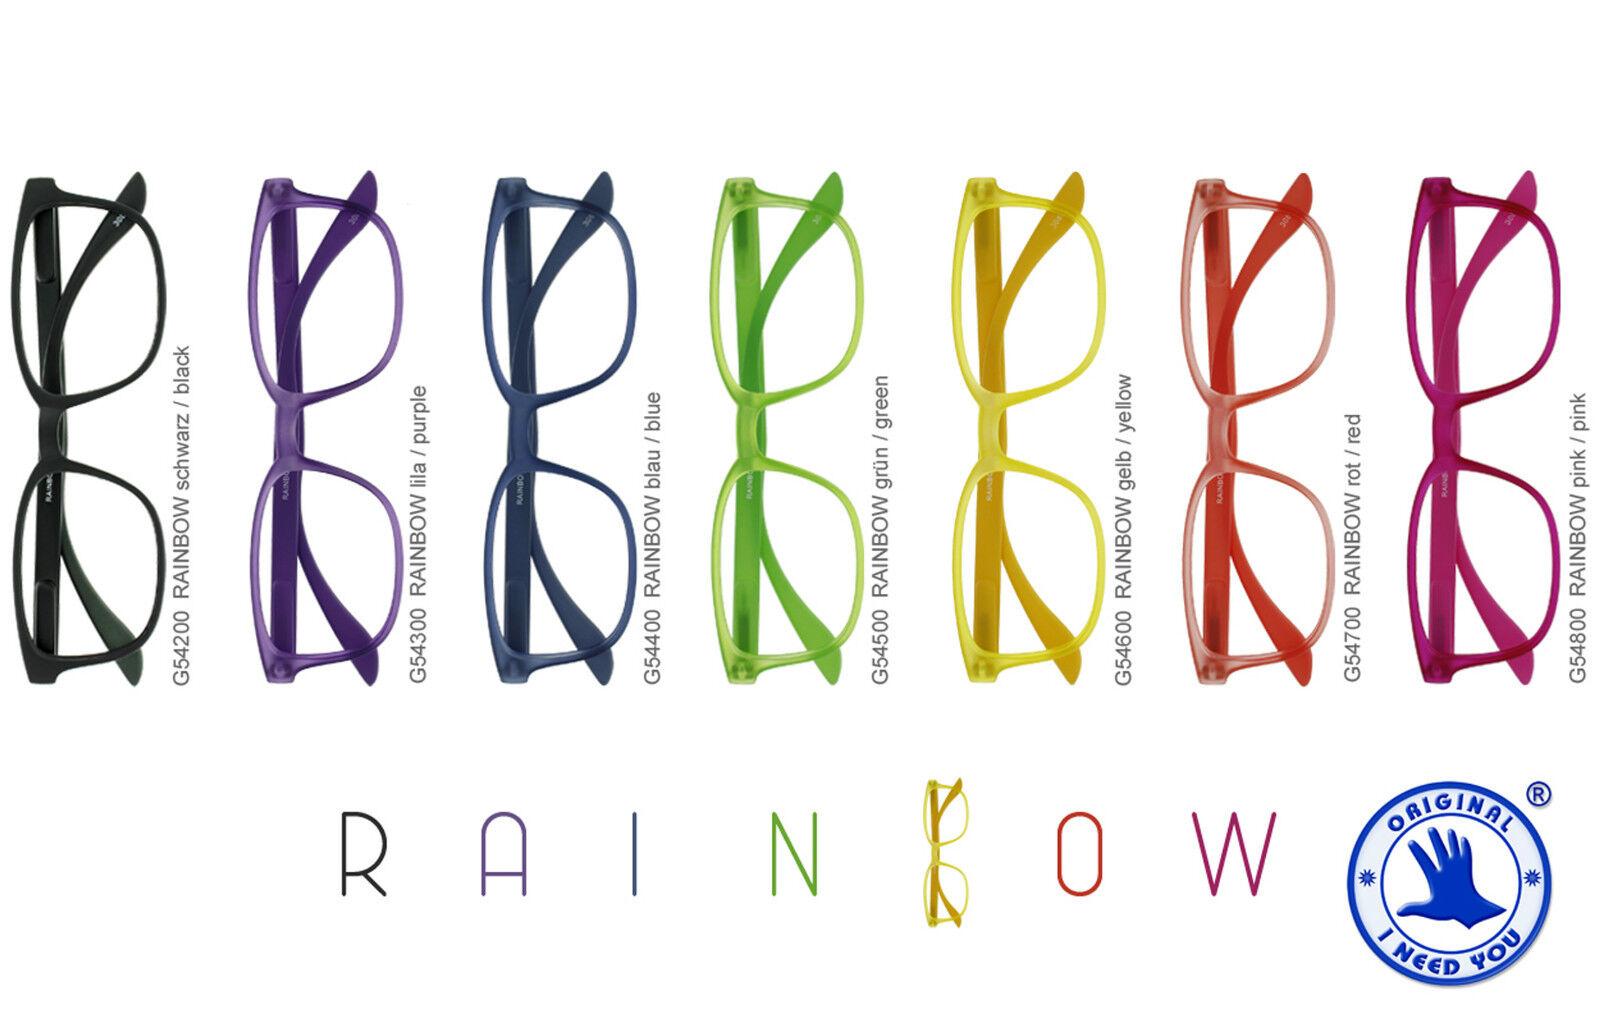 Unisex Lesebrille Rainbow Lesehilfe Brille 1,0 1,5 2,0 2,5 3,0 Neu vom Optiker